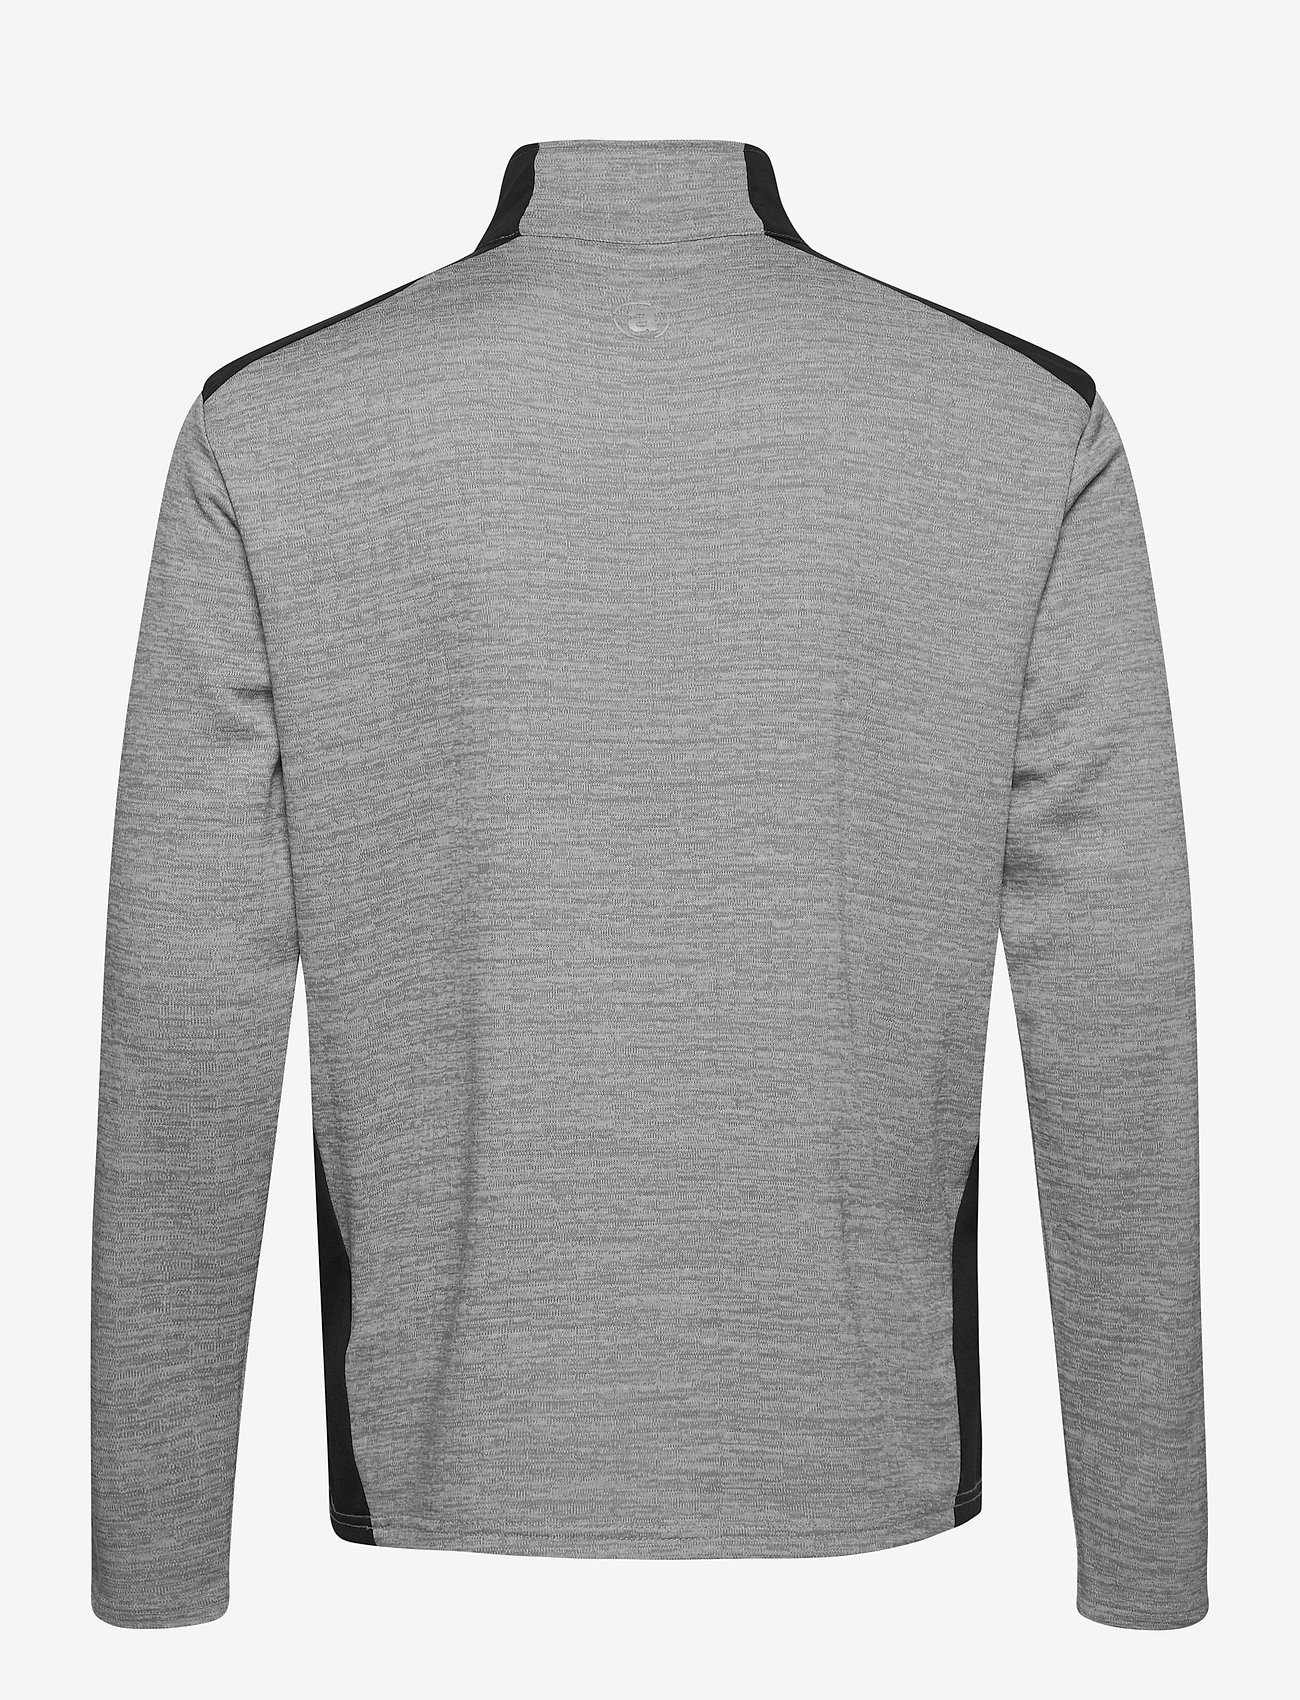 Abacus - Mens Sunningdale halfzip - golf jackets - lt.grey/black - 1